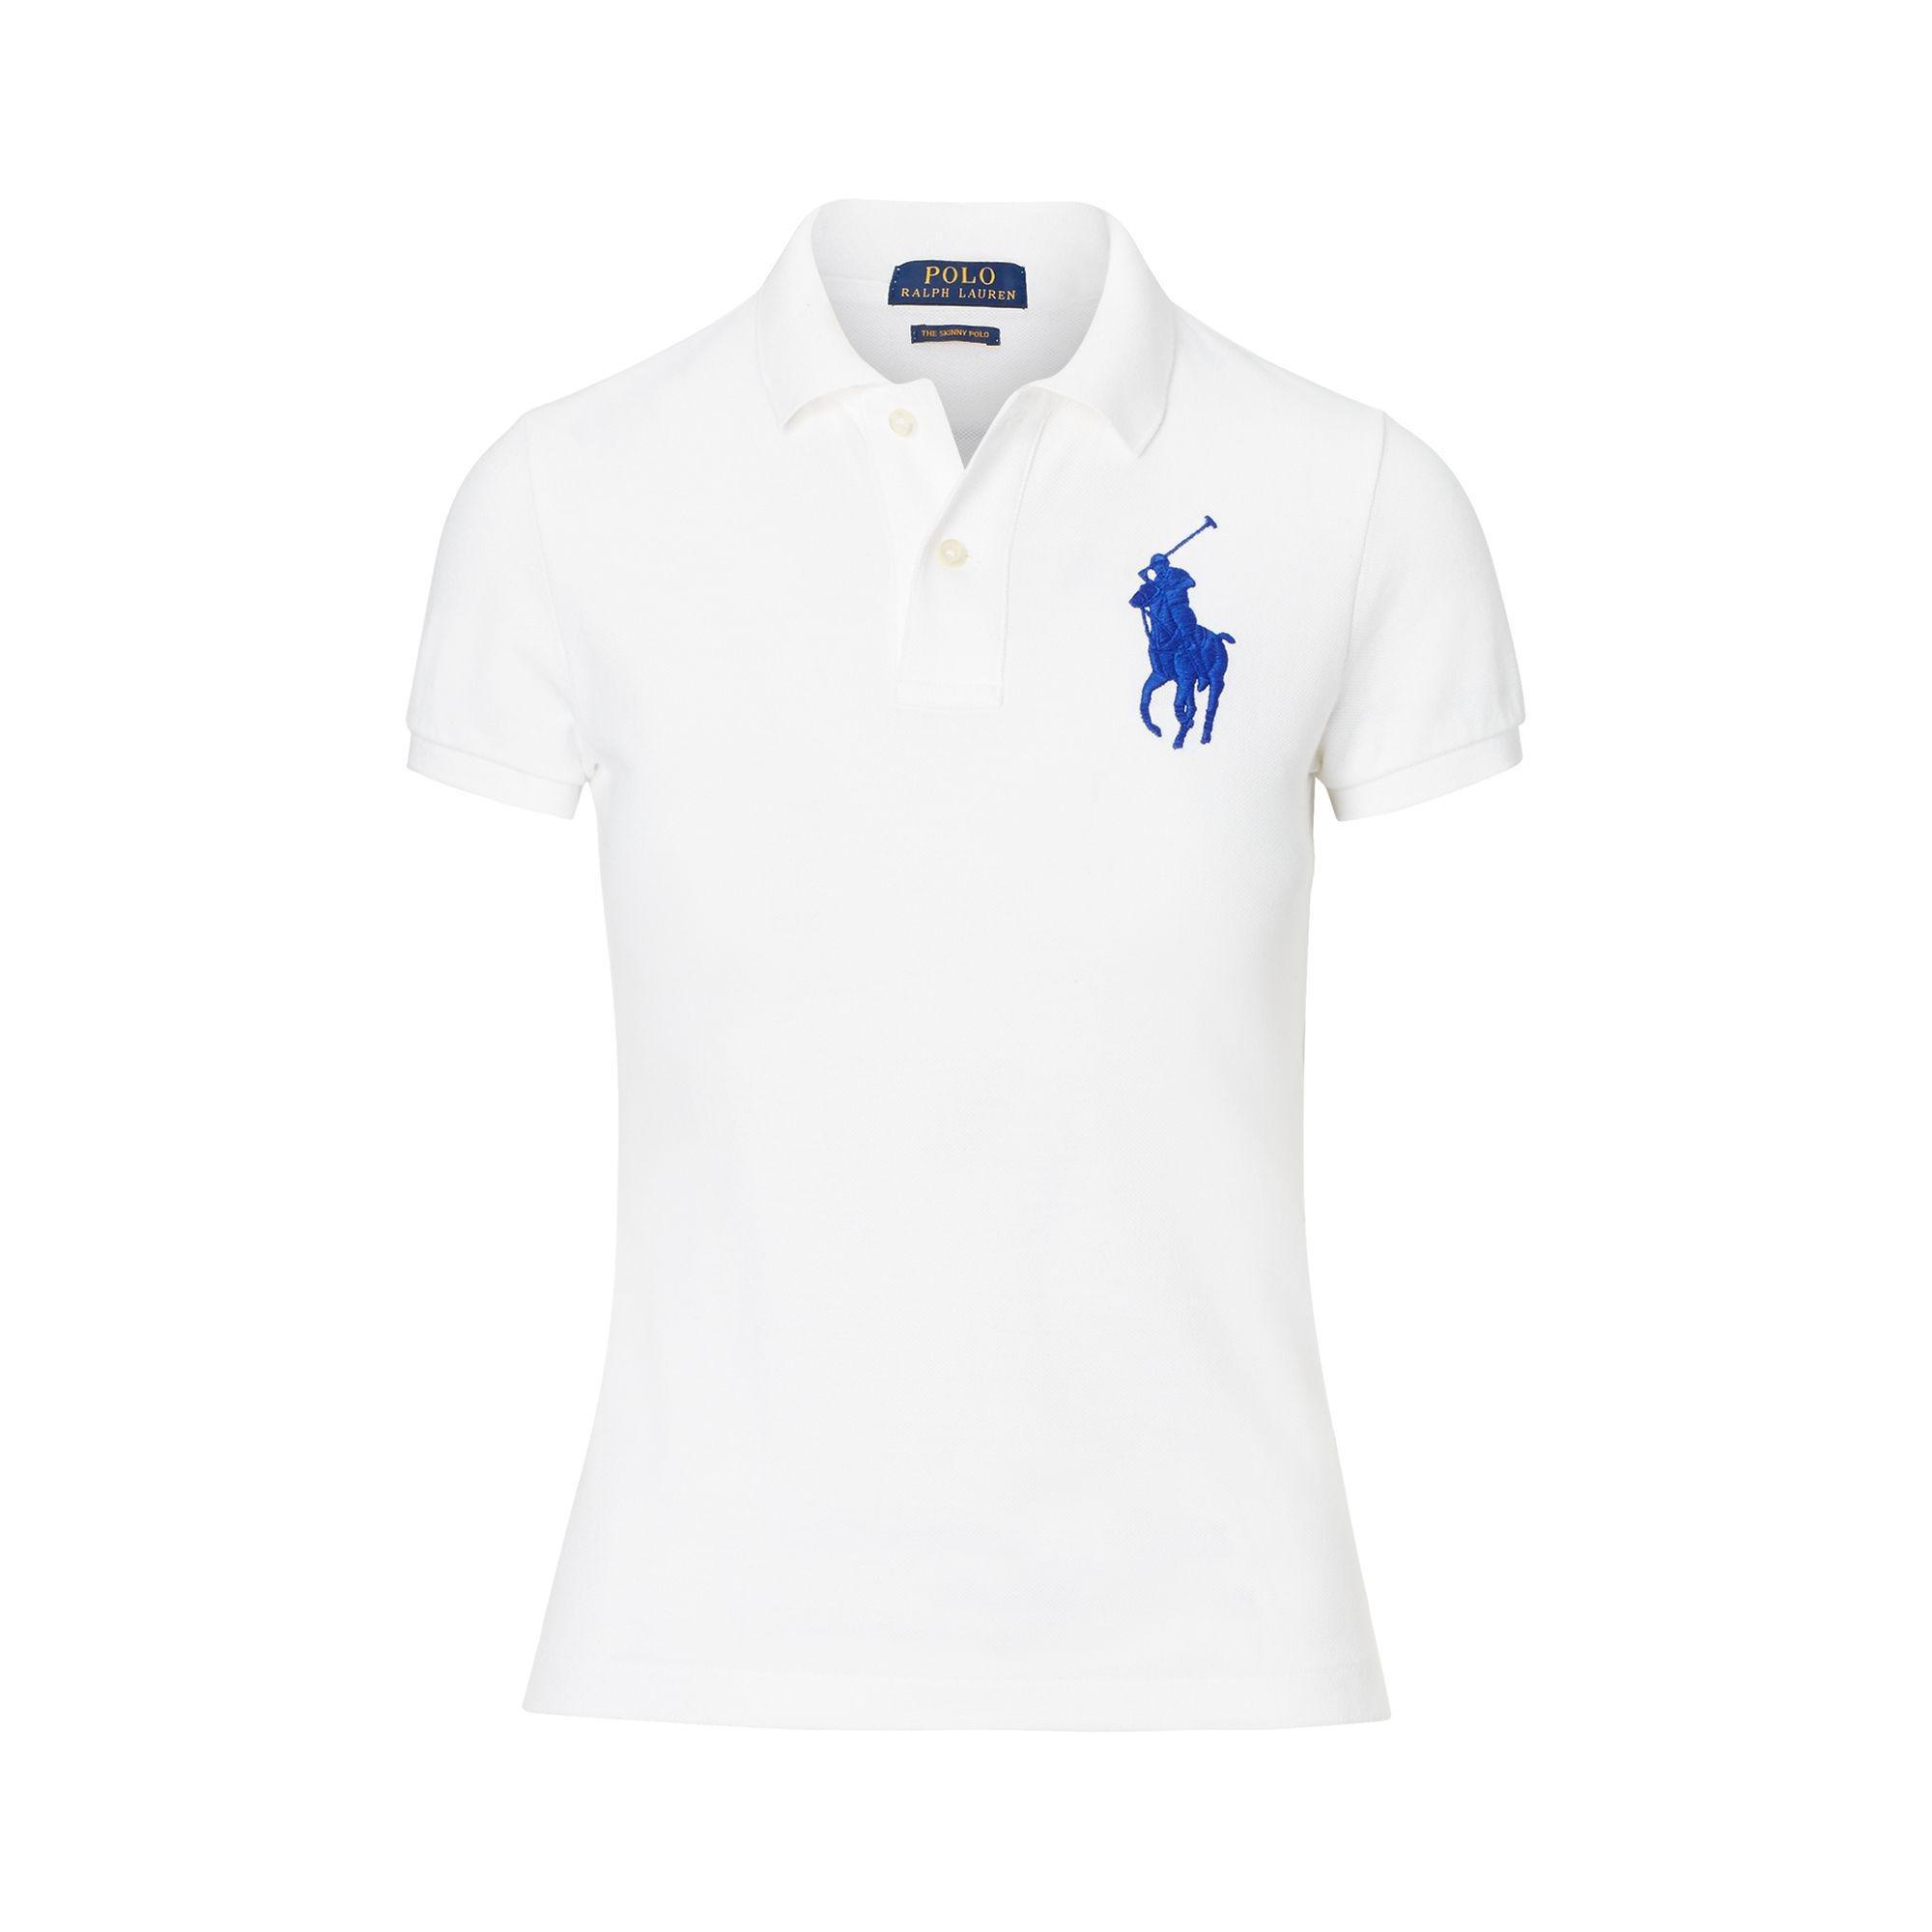 Shirt Women's Fit Big White Polo Pony Skinny LzMSGqUVp